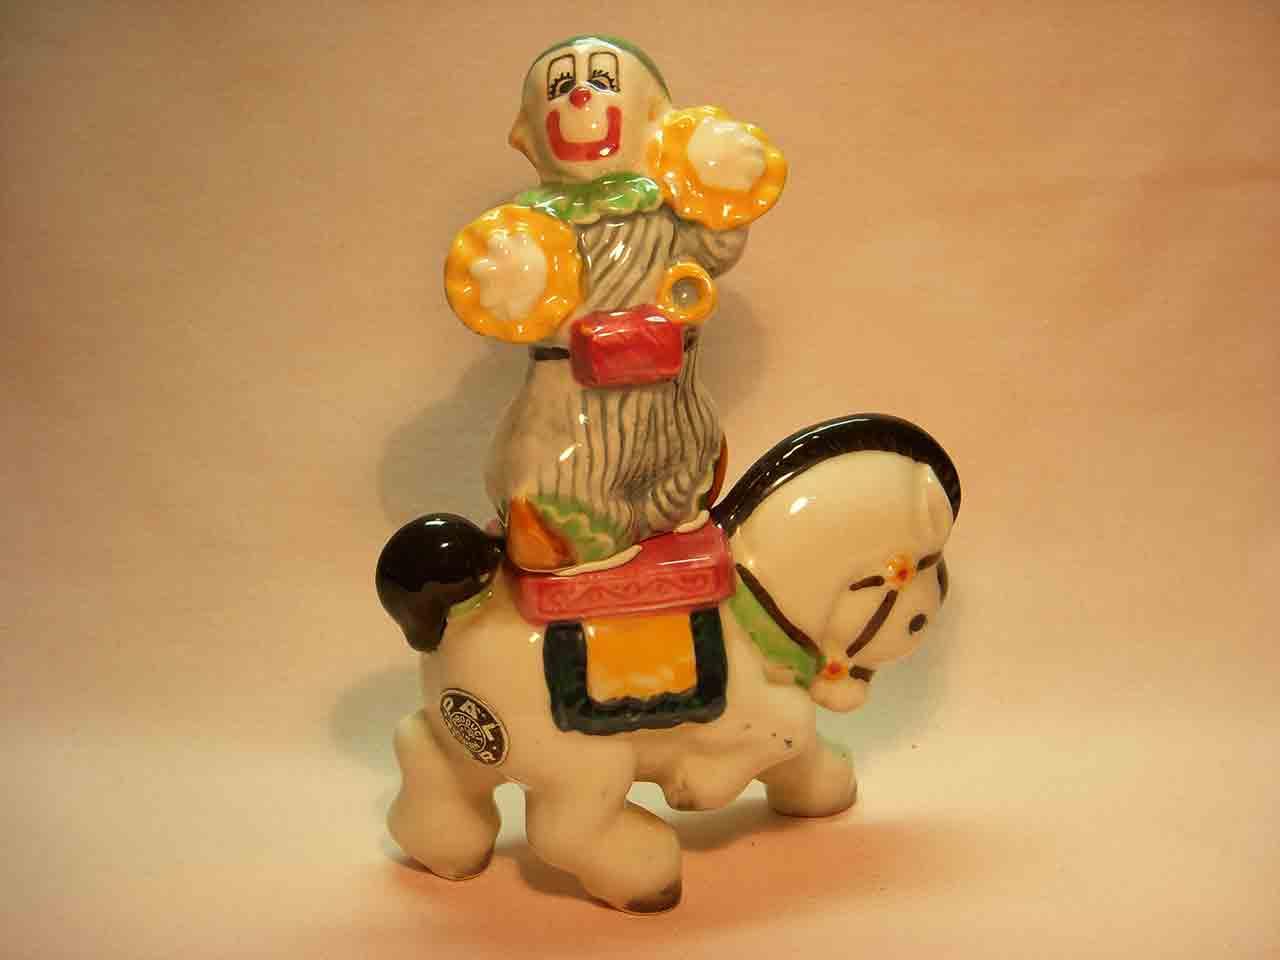 Clarabell the clown on a horse salt and pepper shaker